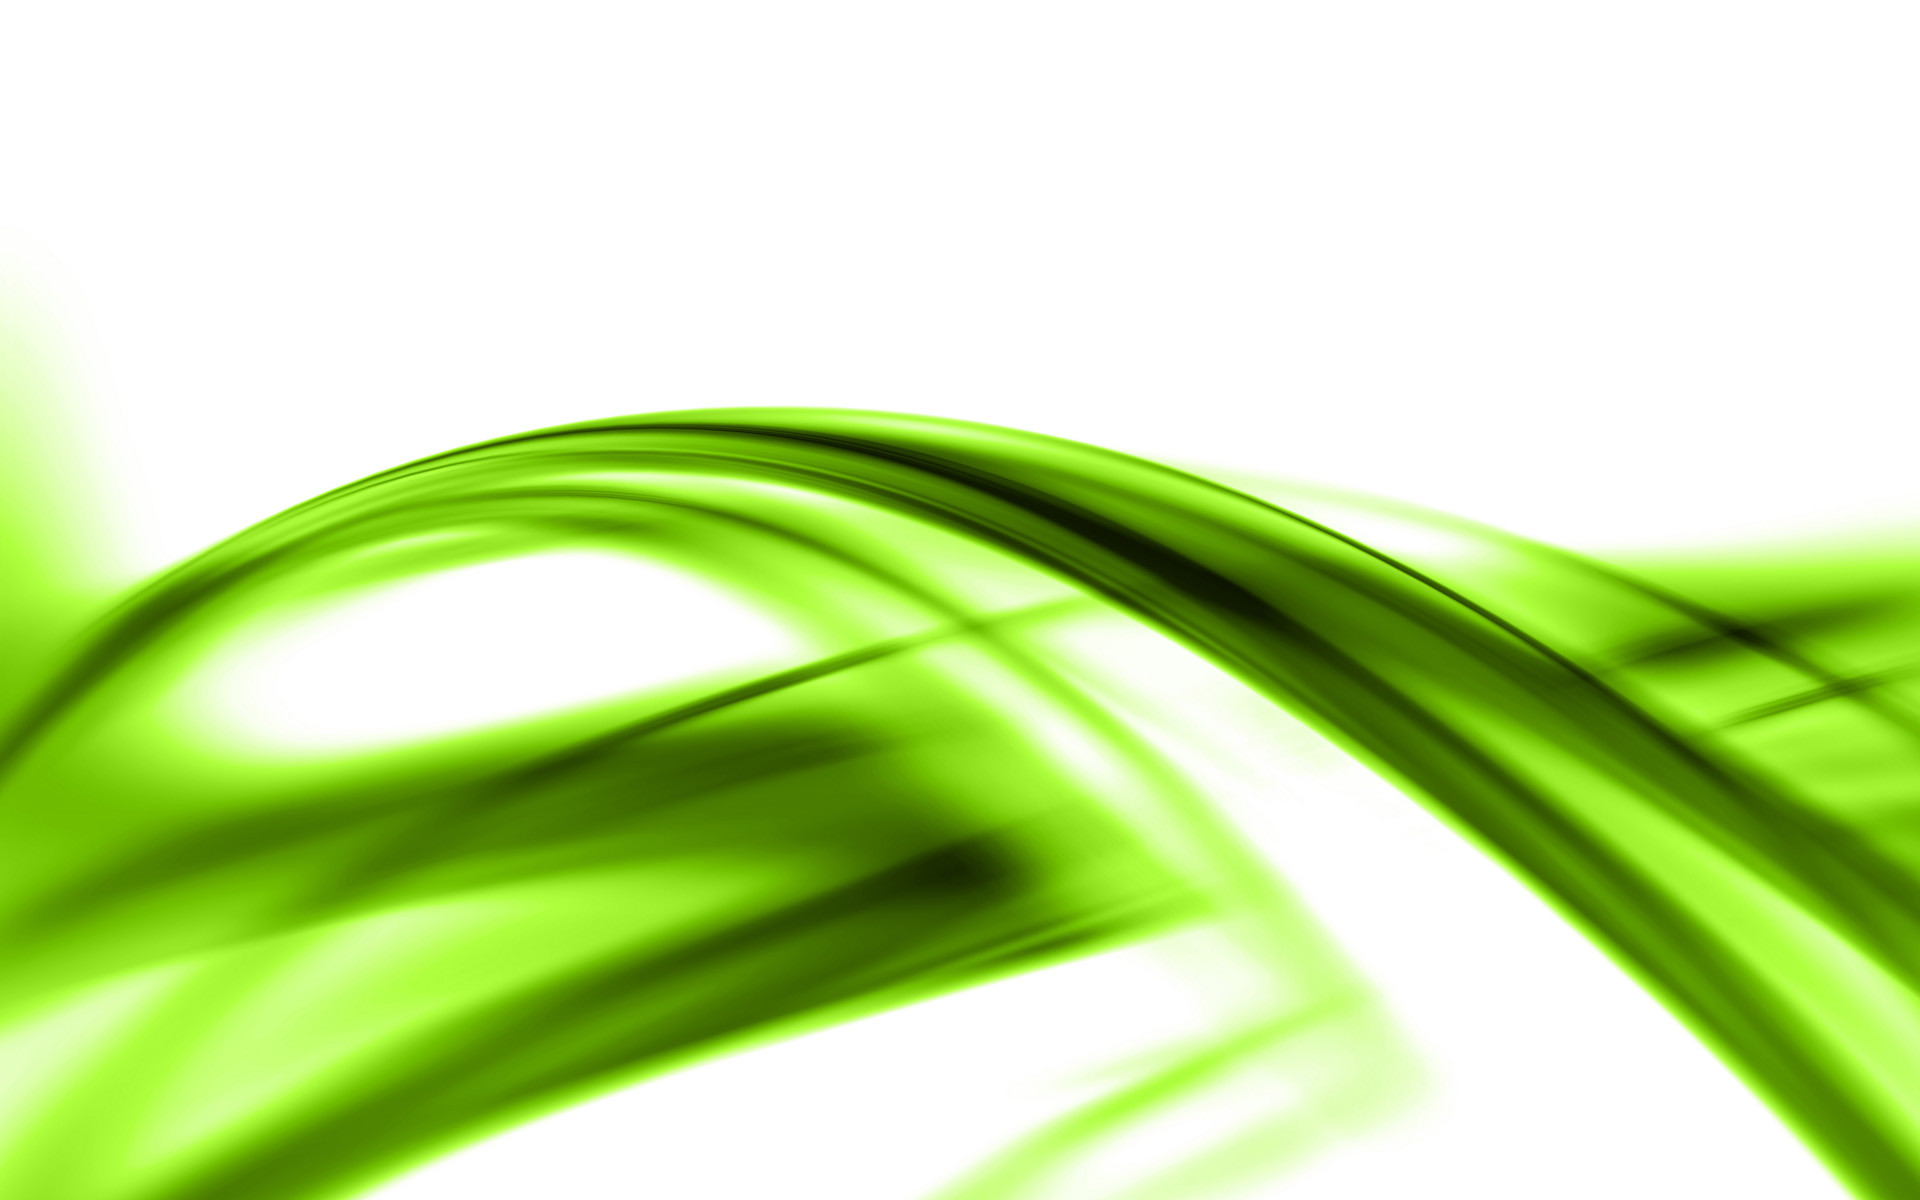 Light green wallpaper is the latest photo craze